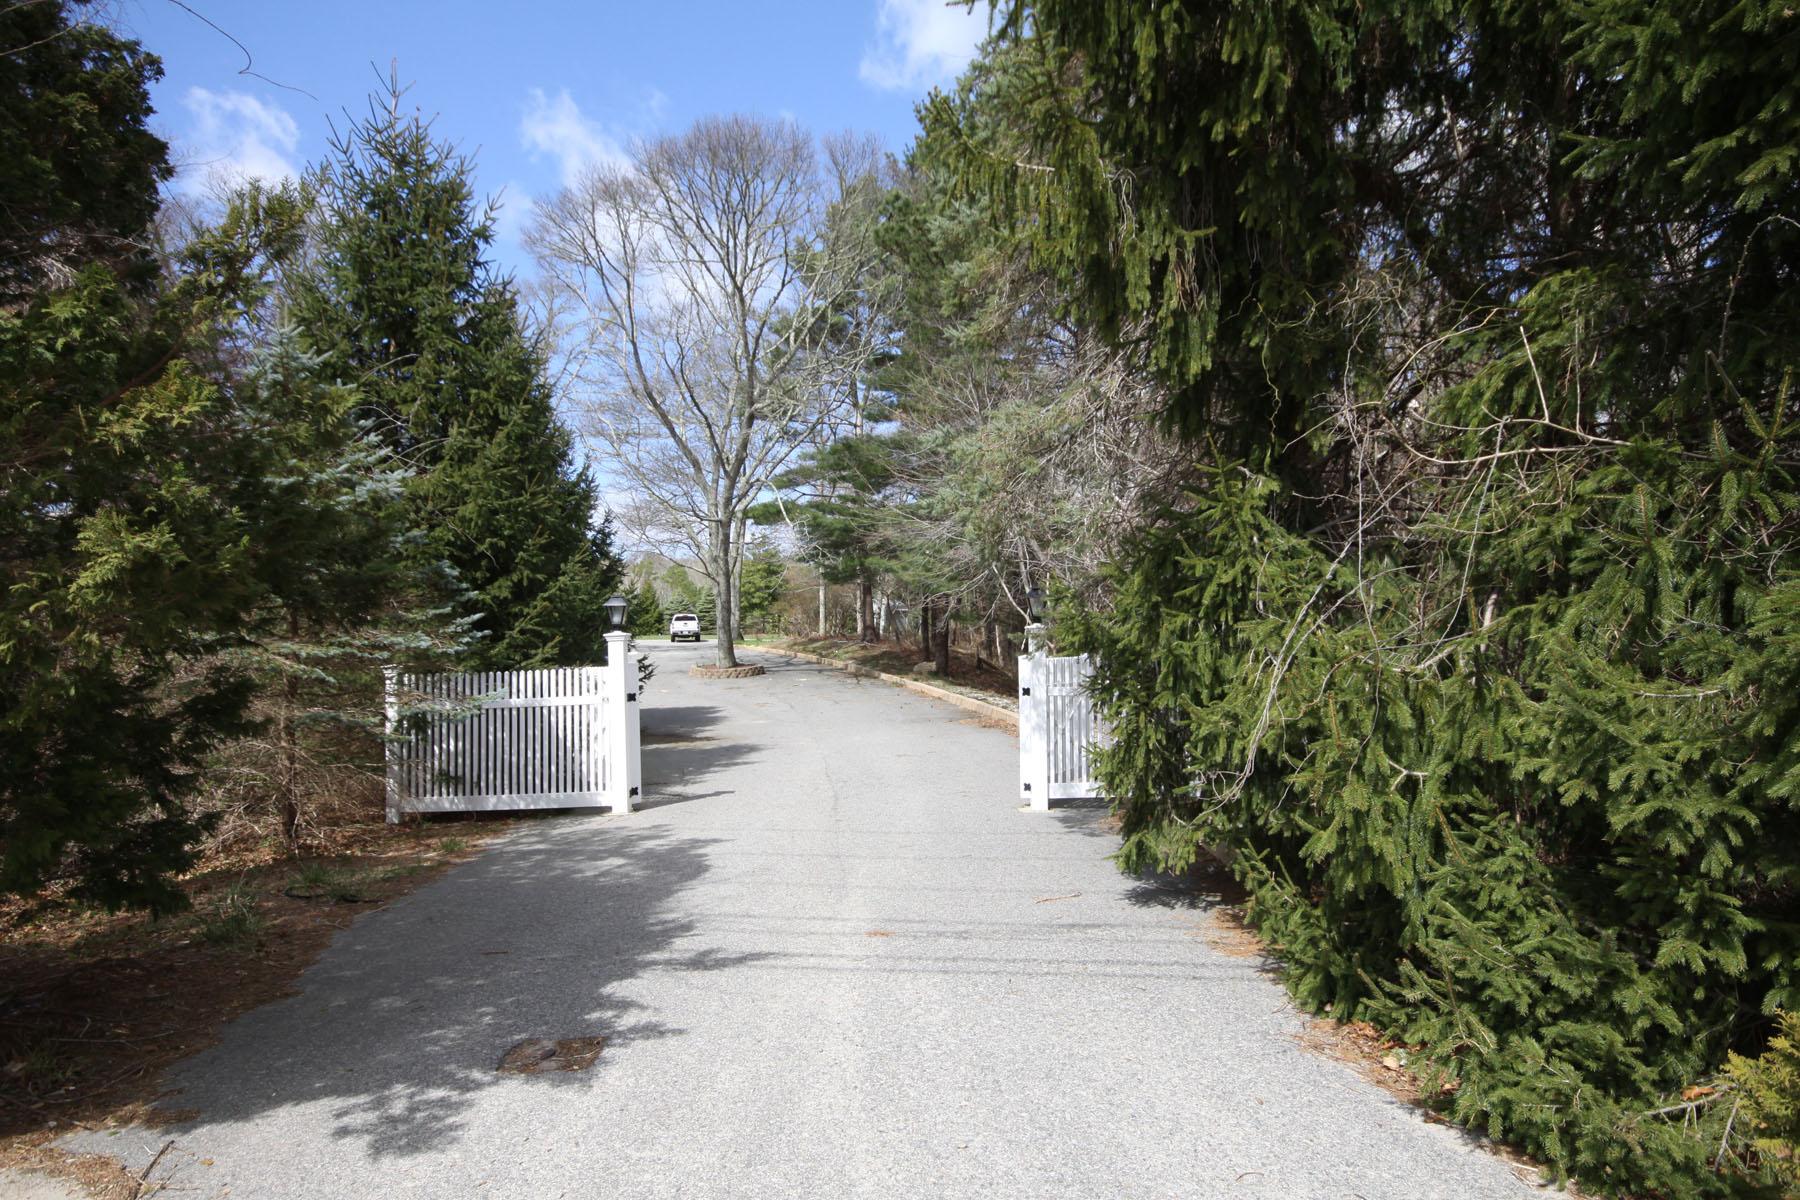 独户住宅 为 销售 在 PRIVACY AWAITS! 744 North Falmouth Highway 东法尔茅斯, 马萨诸塞州, 02556 美国